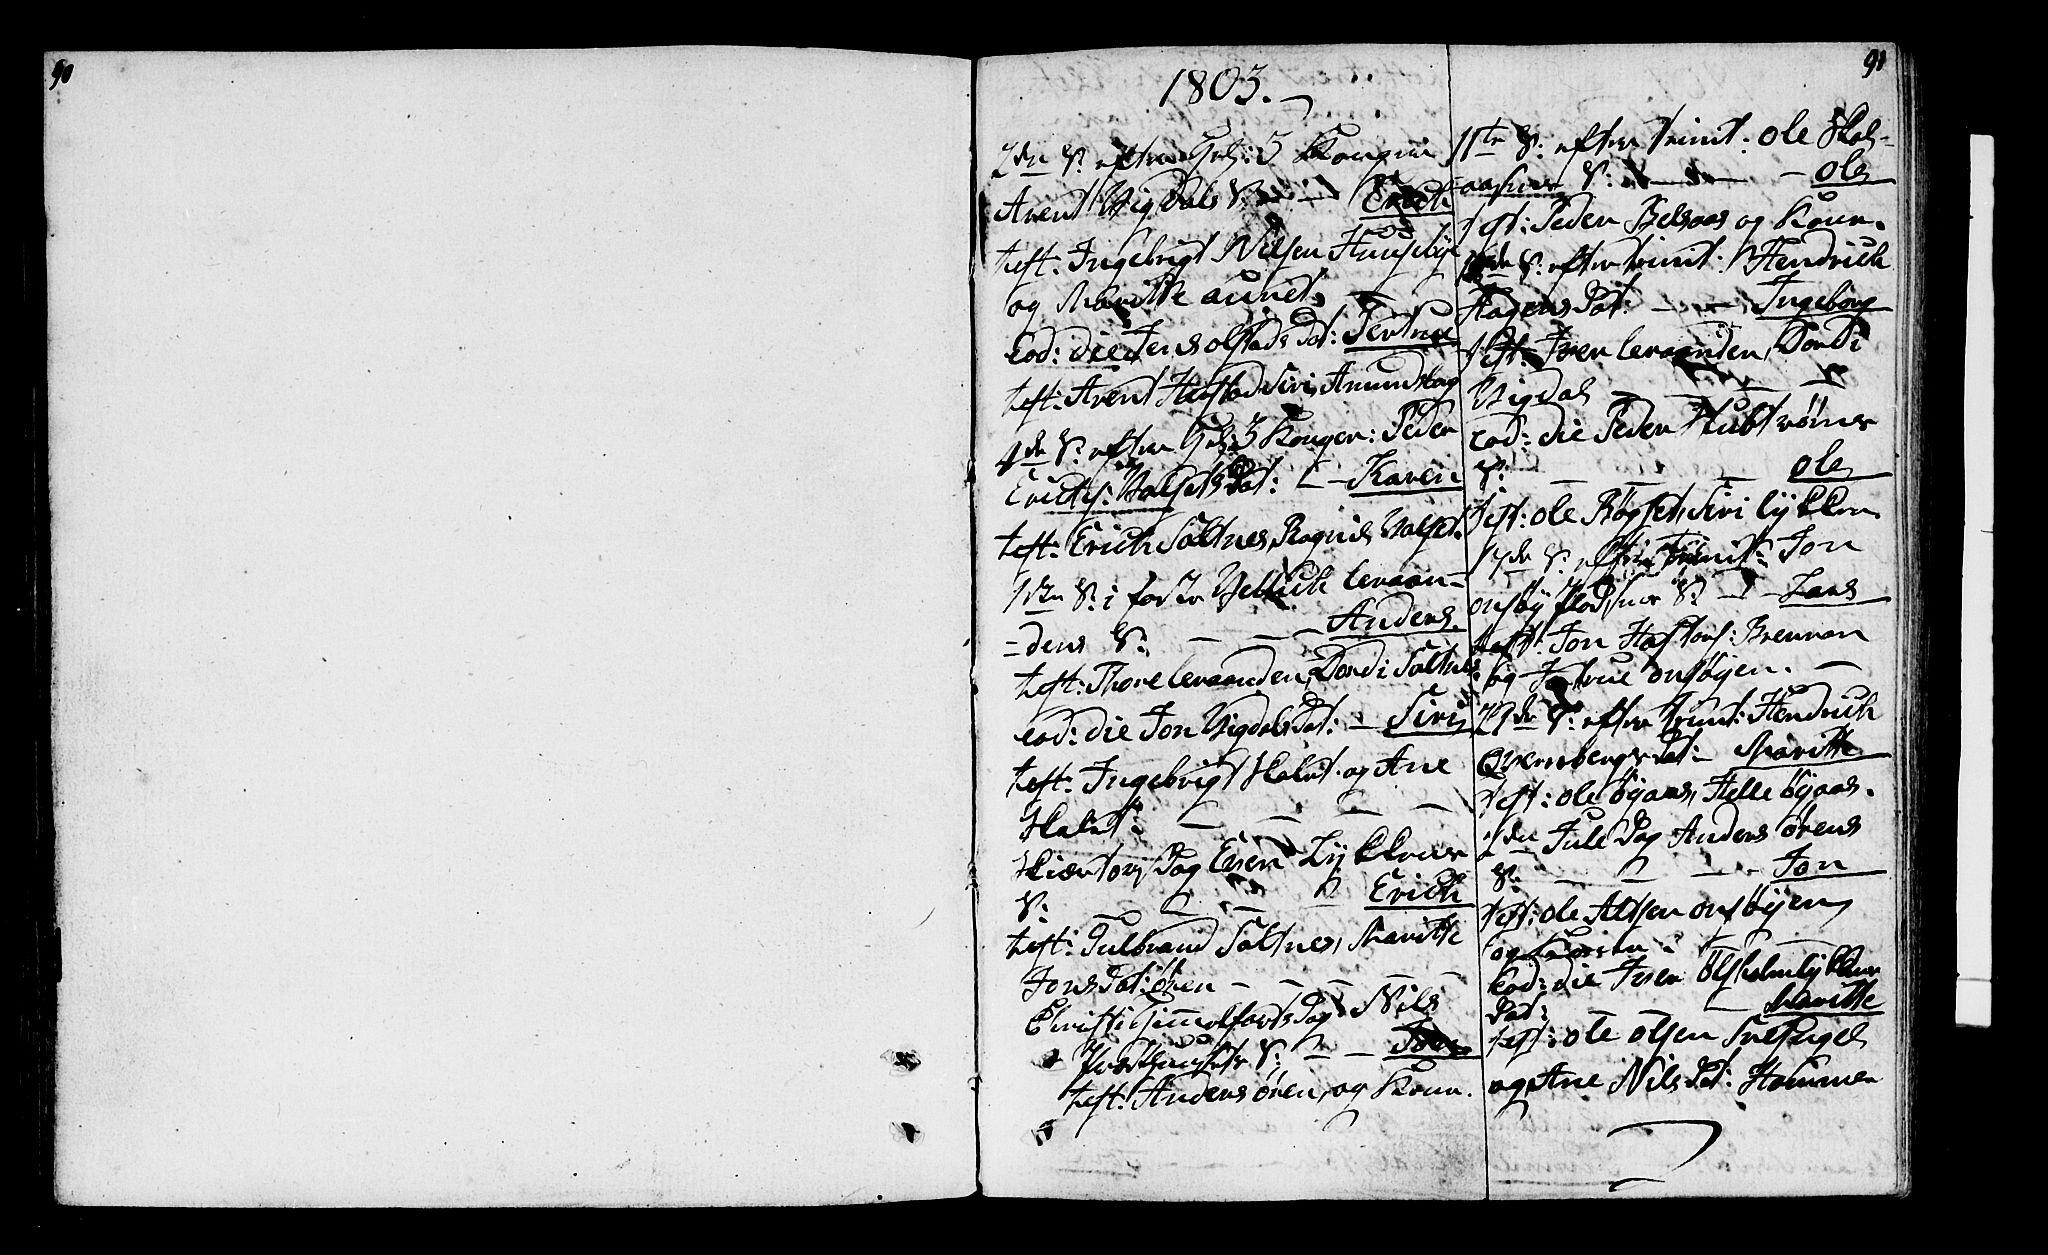 SAT, Ministerialprotokoller, klokkerbøker og fødselsregistre - Sør-Trøndelag, 666/L0785: Parish register (official) no. 666A03, 1803-1816, p. 90-91